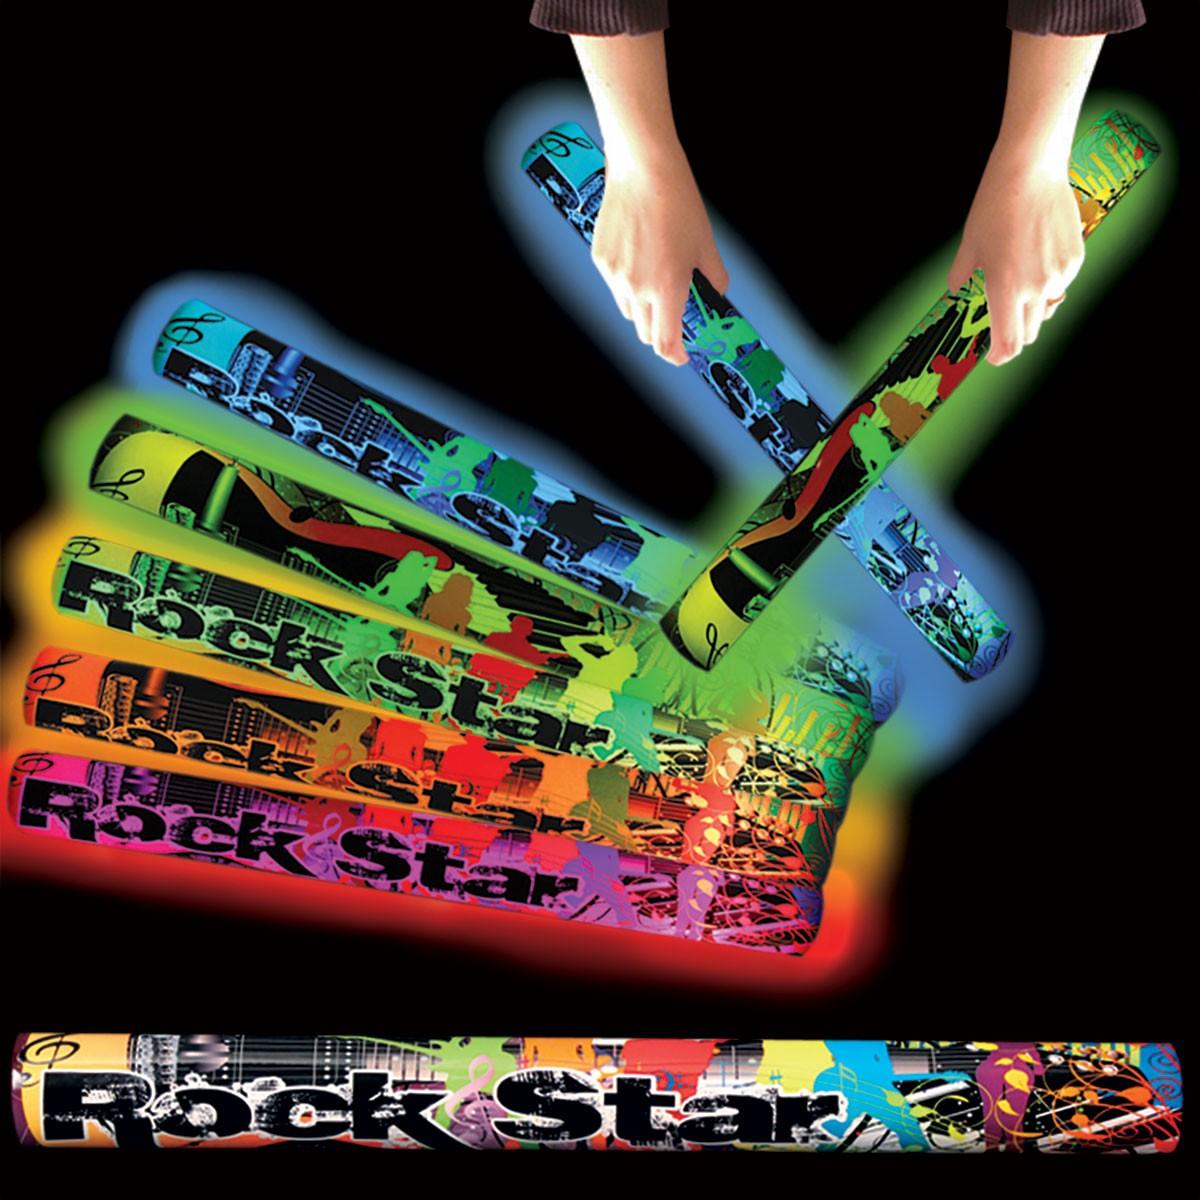 ILLUMI-TON W ROCK STAR THEME